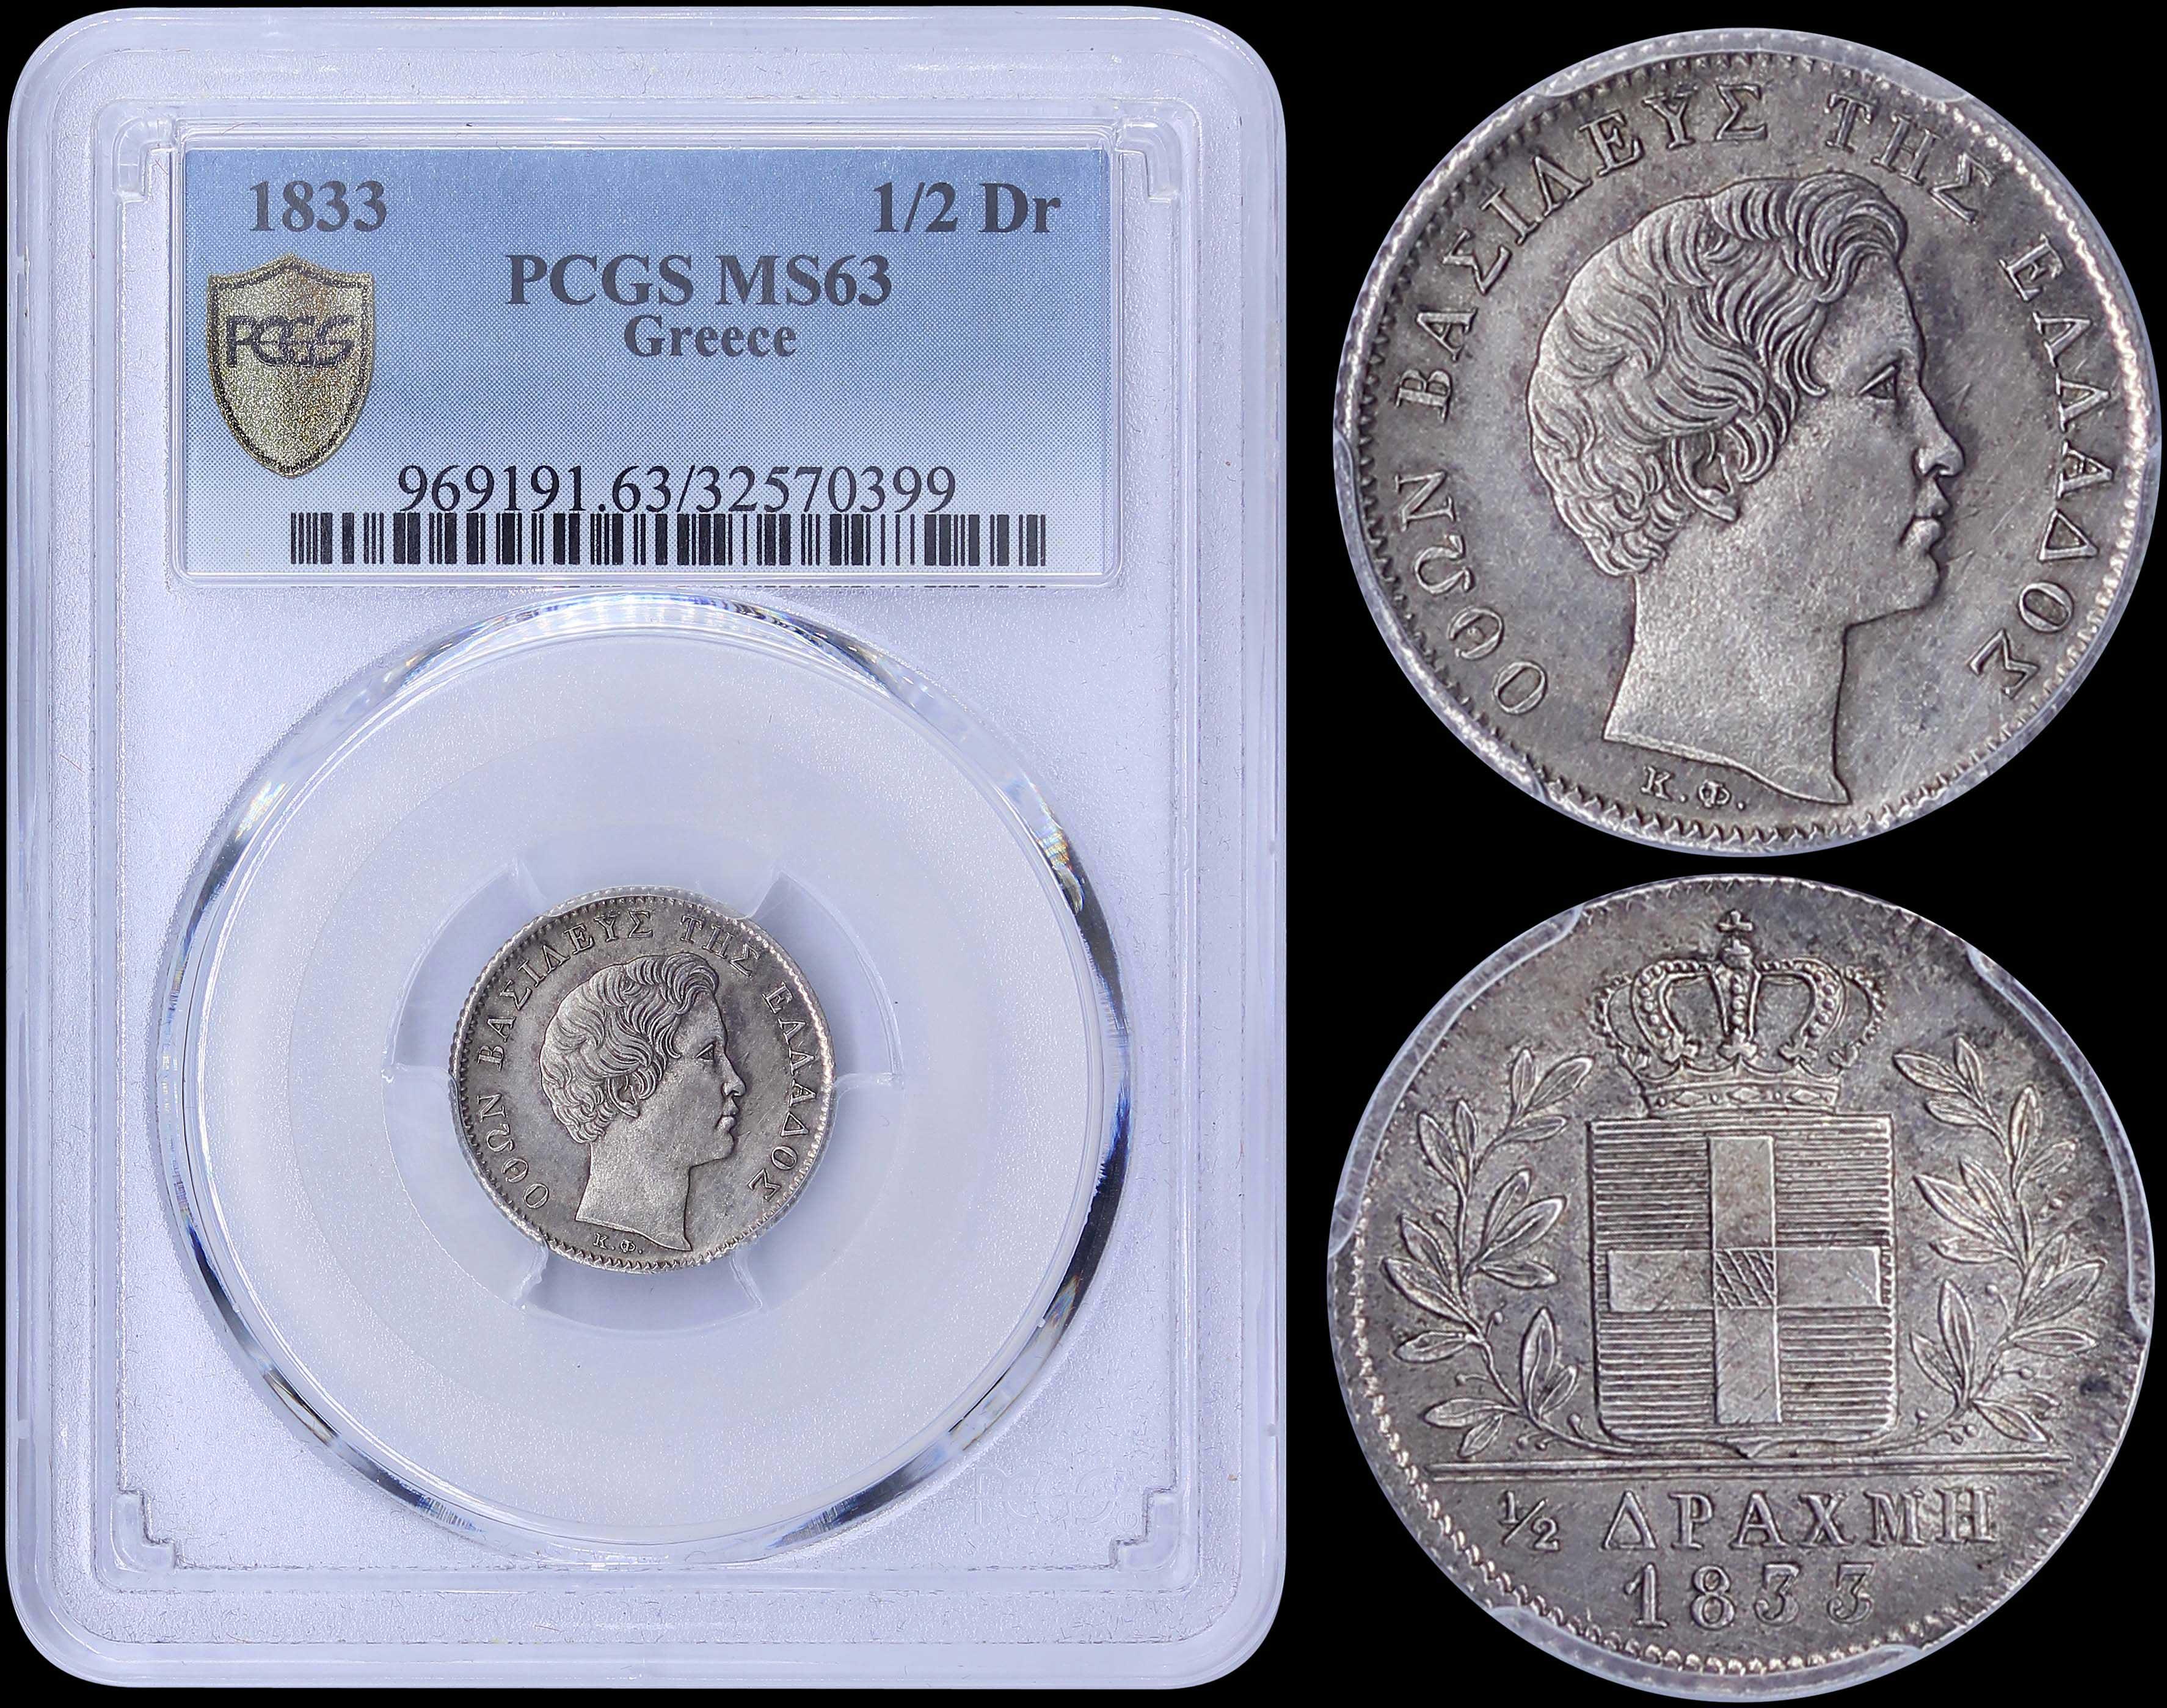 Lot 6015 - -  COINS & TOKENS king otto -  A. Karamitsos Live Bid Auction Coins, Medals & Banknotes